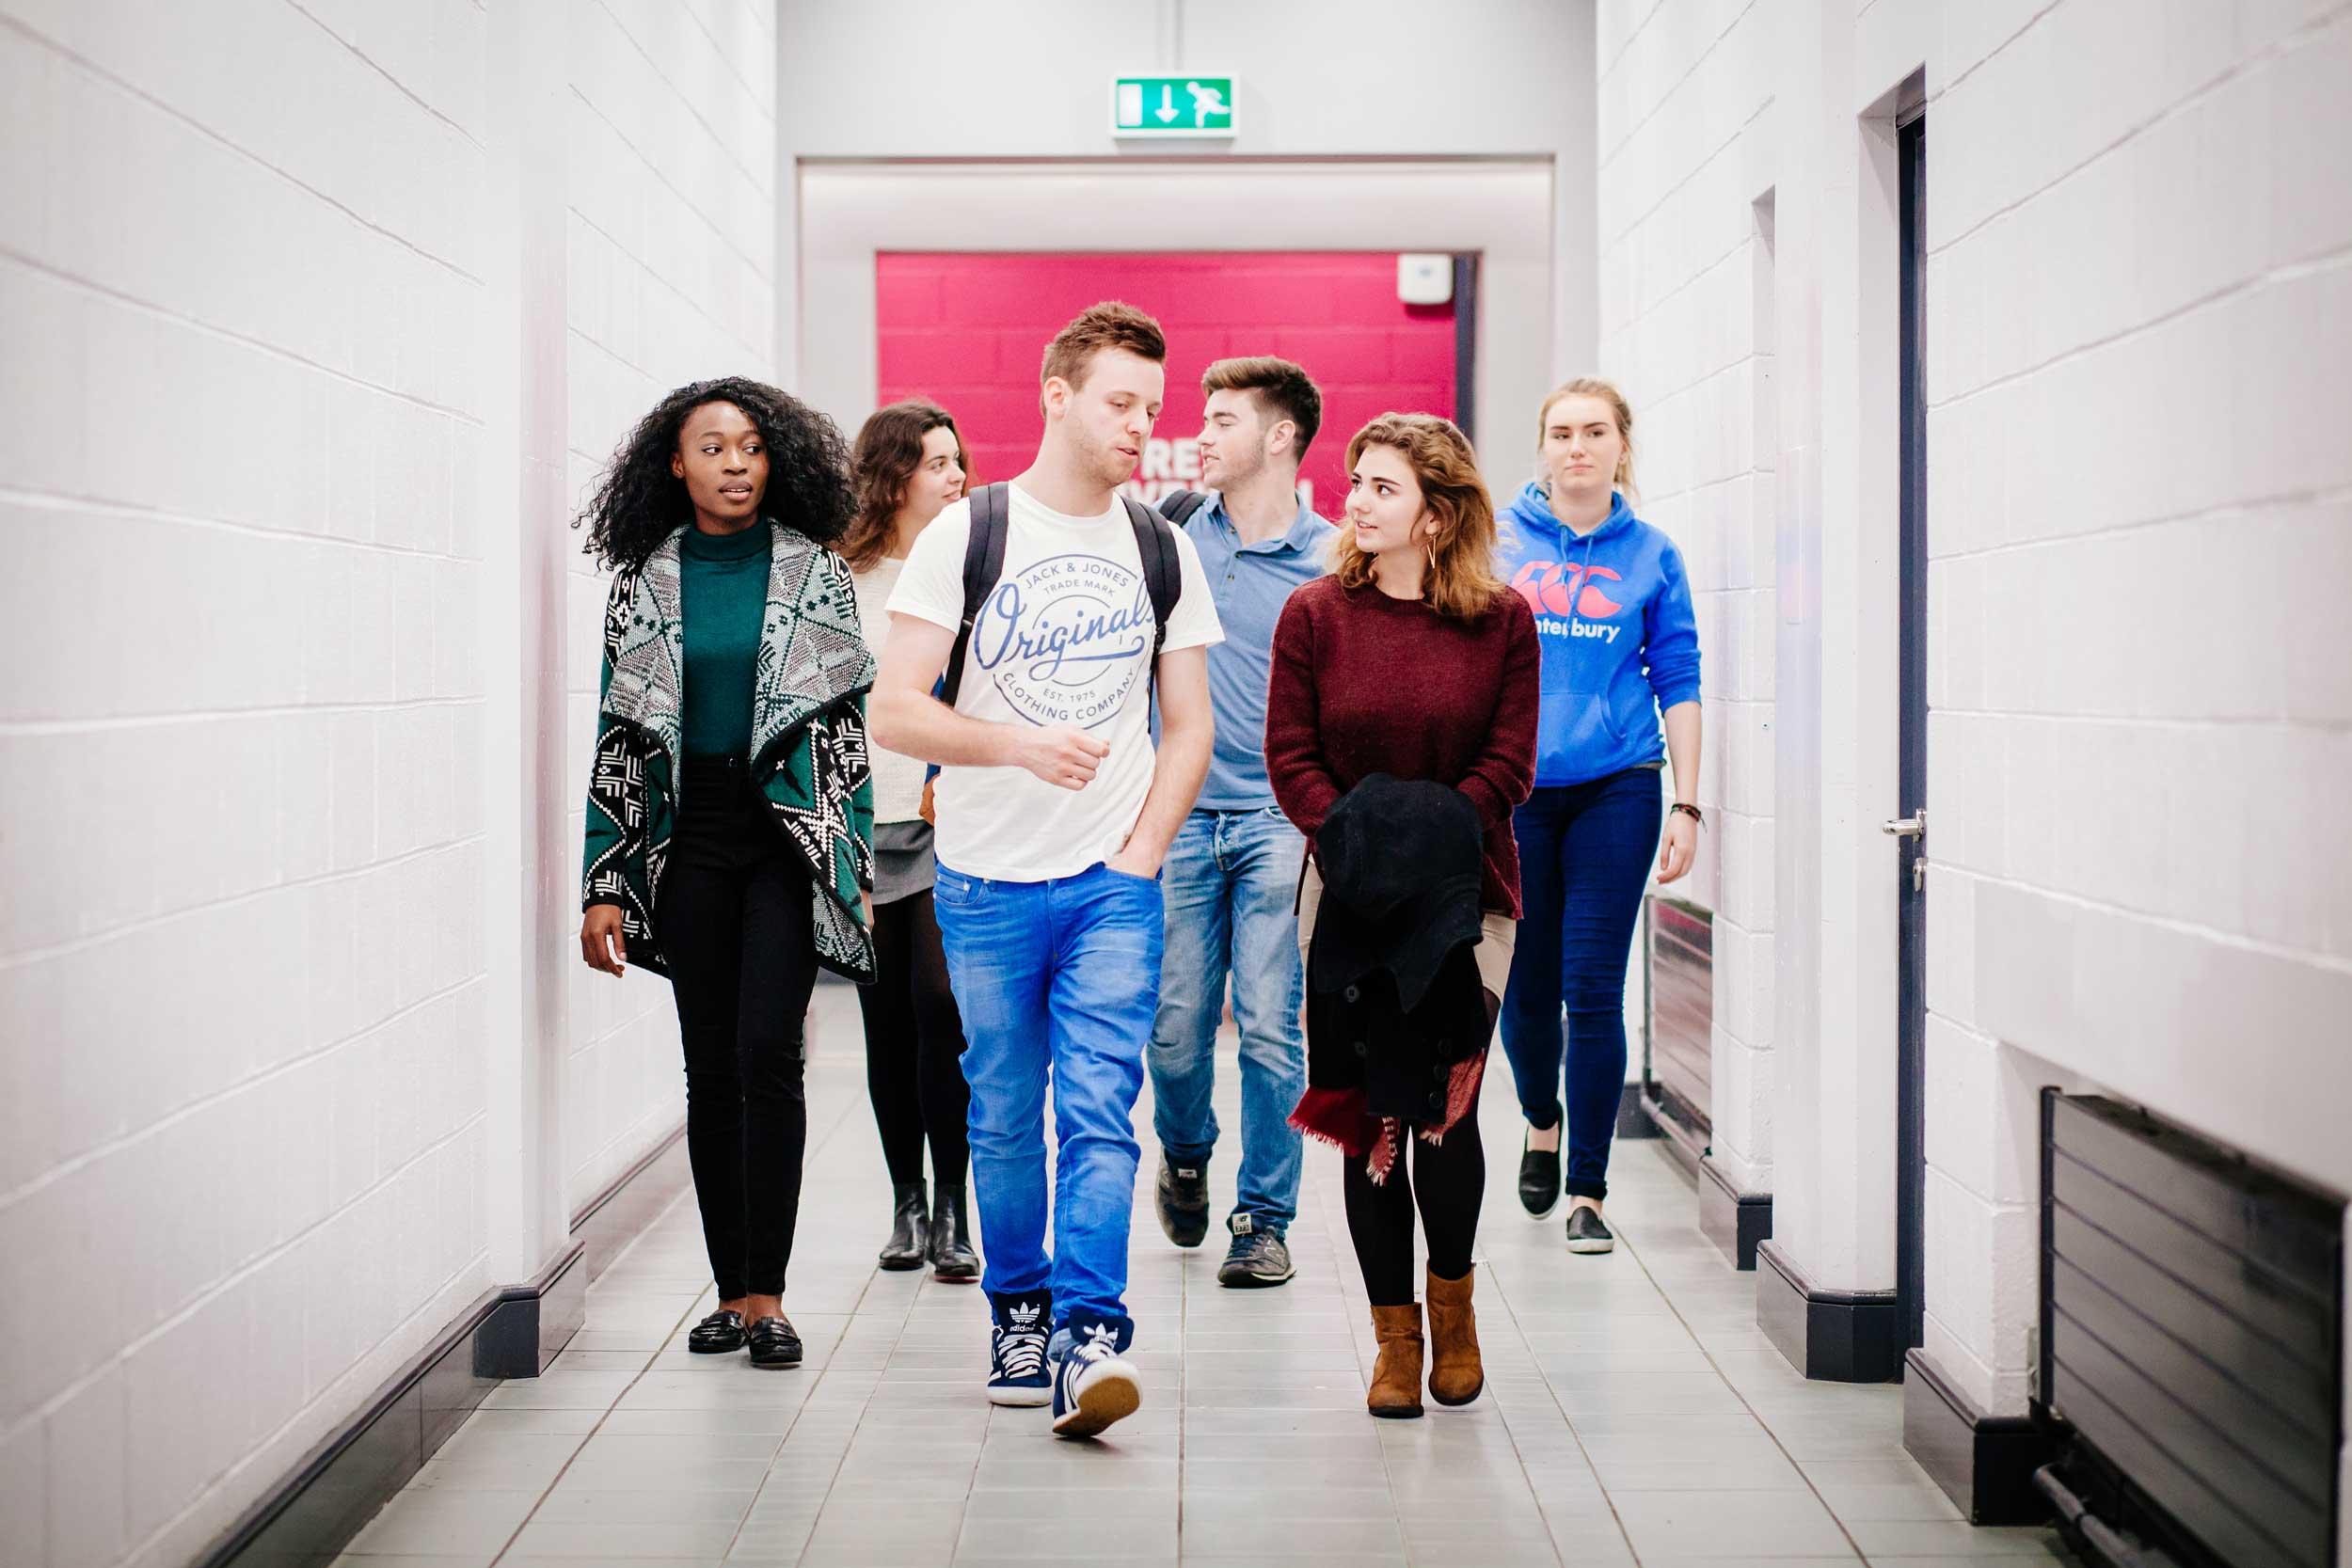 Dublin City University wins ECIU Team Award